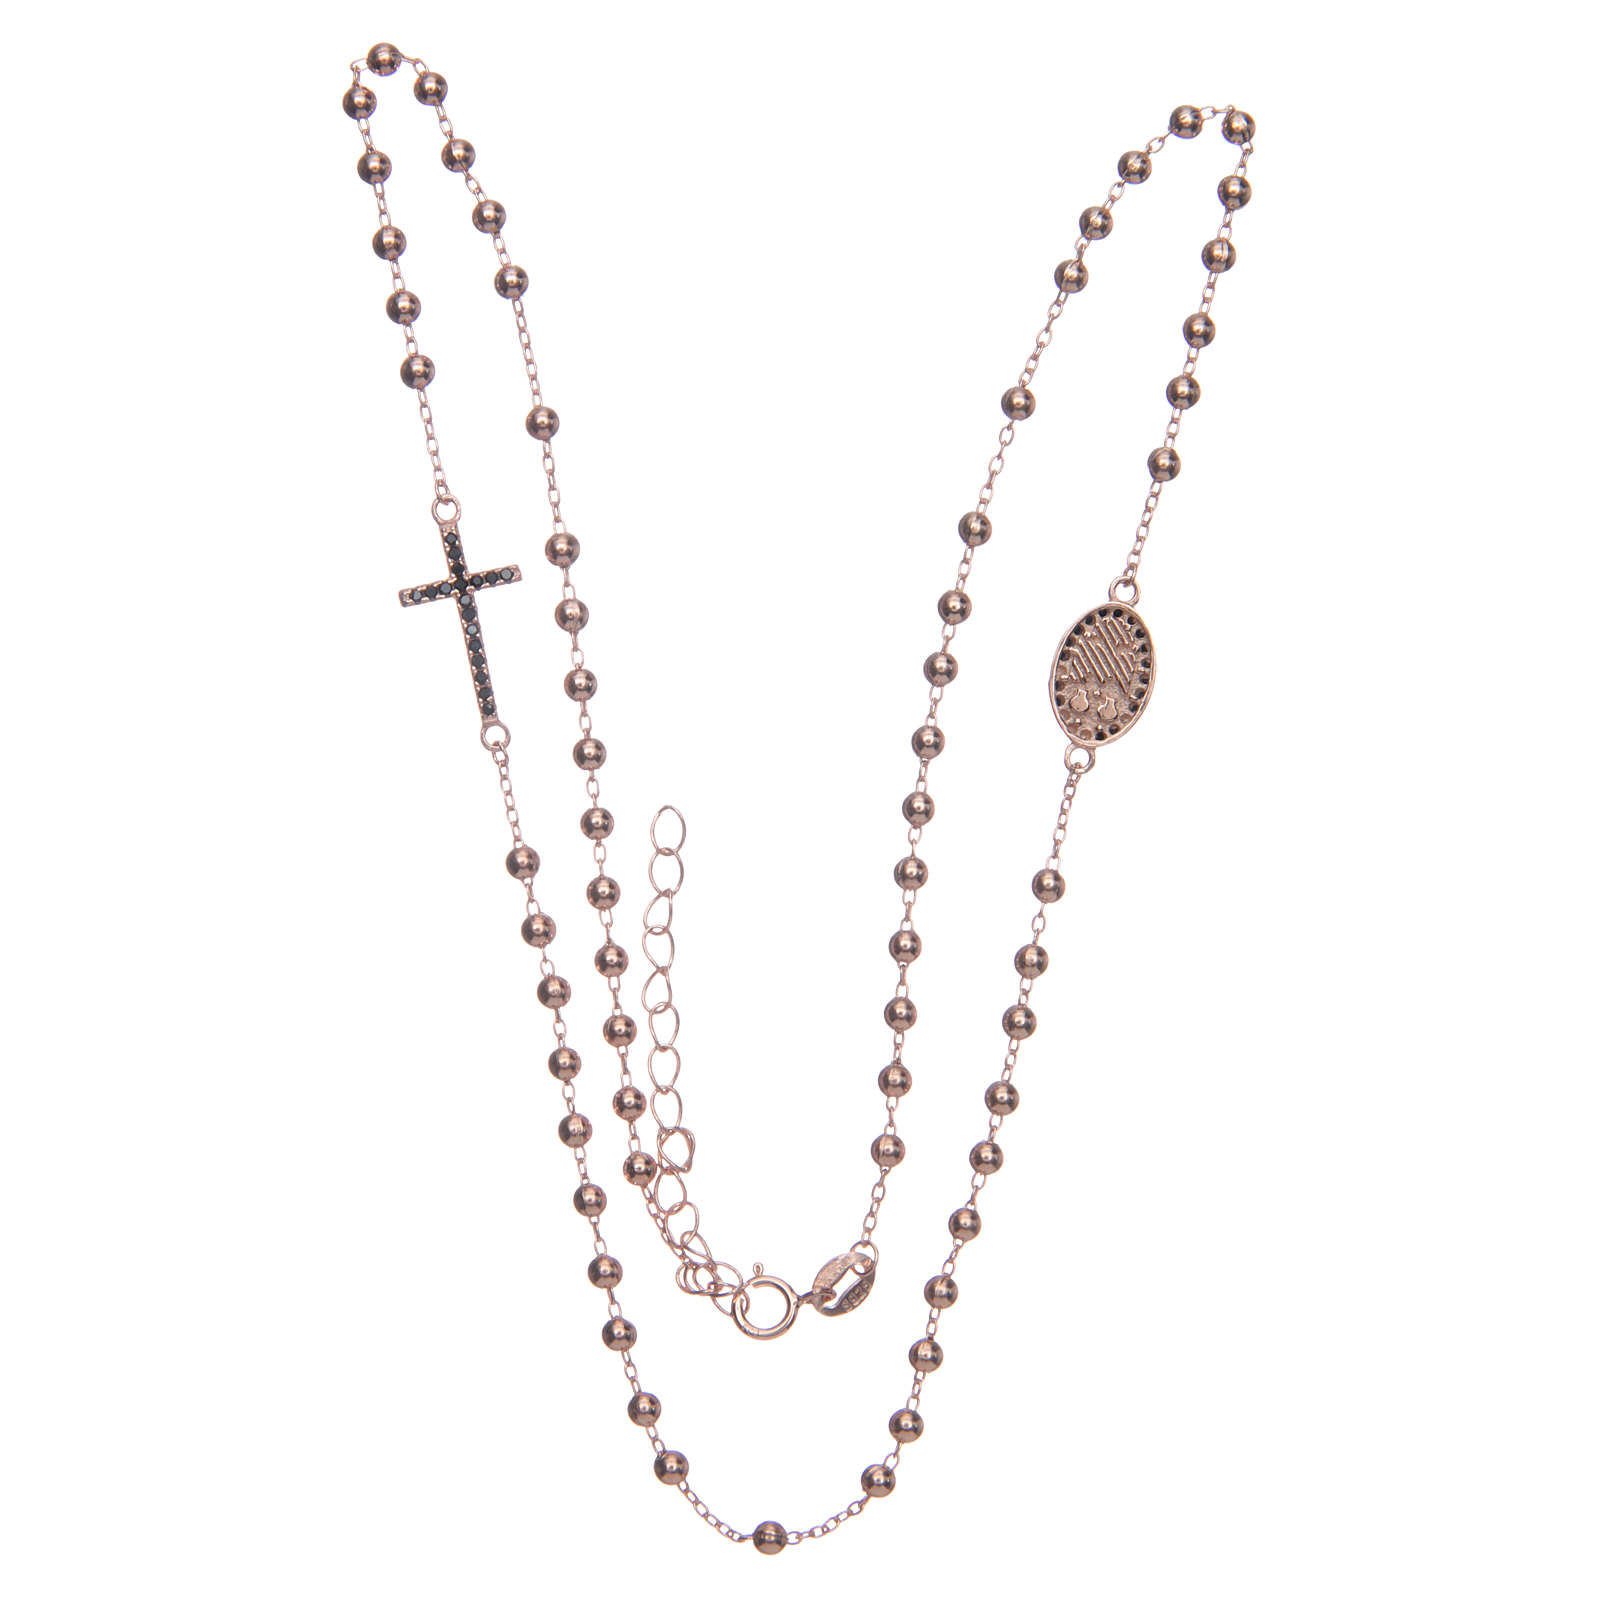 Rosario girocollo Santa Rita rosé zirconi neri argento 925 4